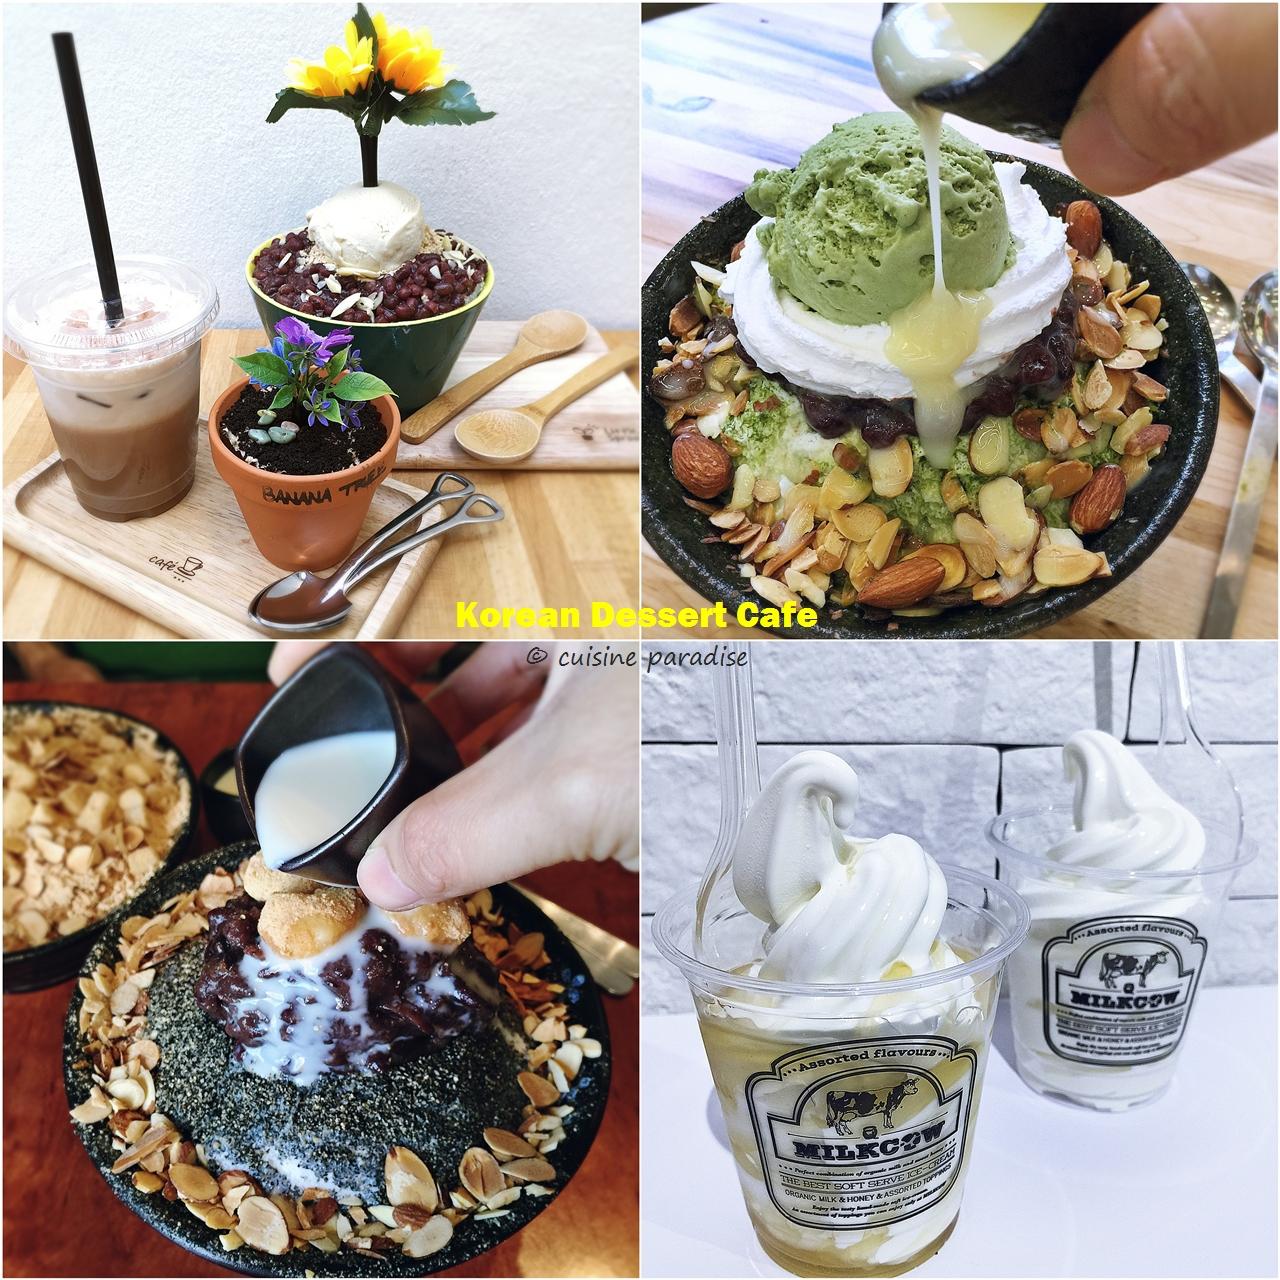 Cuisine paradise singapore food blog recipes reviews and travel korean dessert in singapore bingsu vs soft serve ice cream forumfinder Gallery